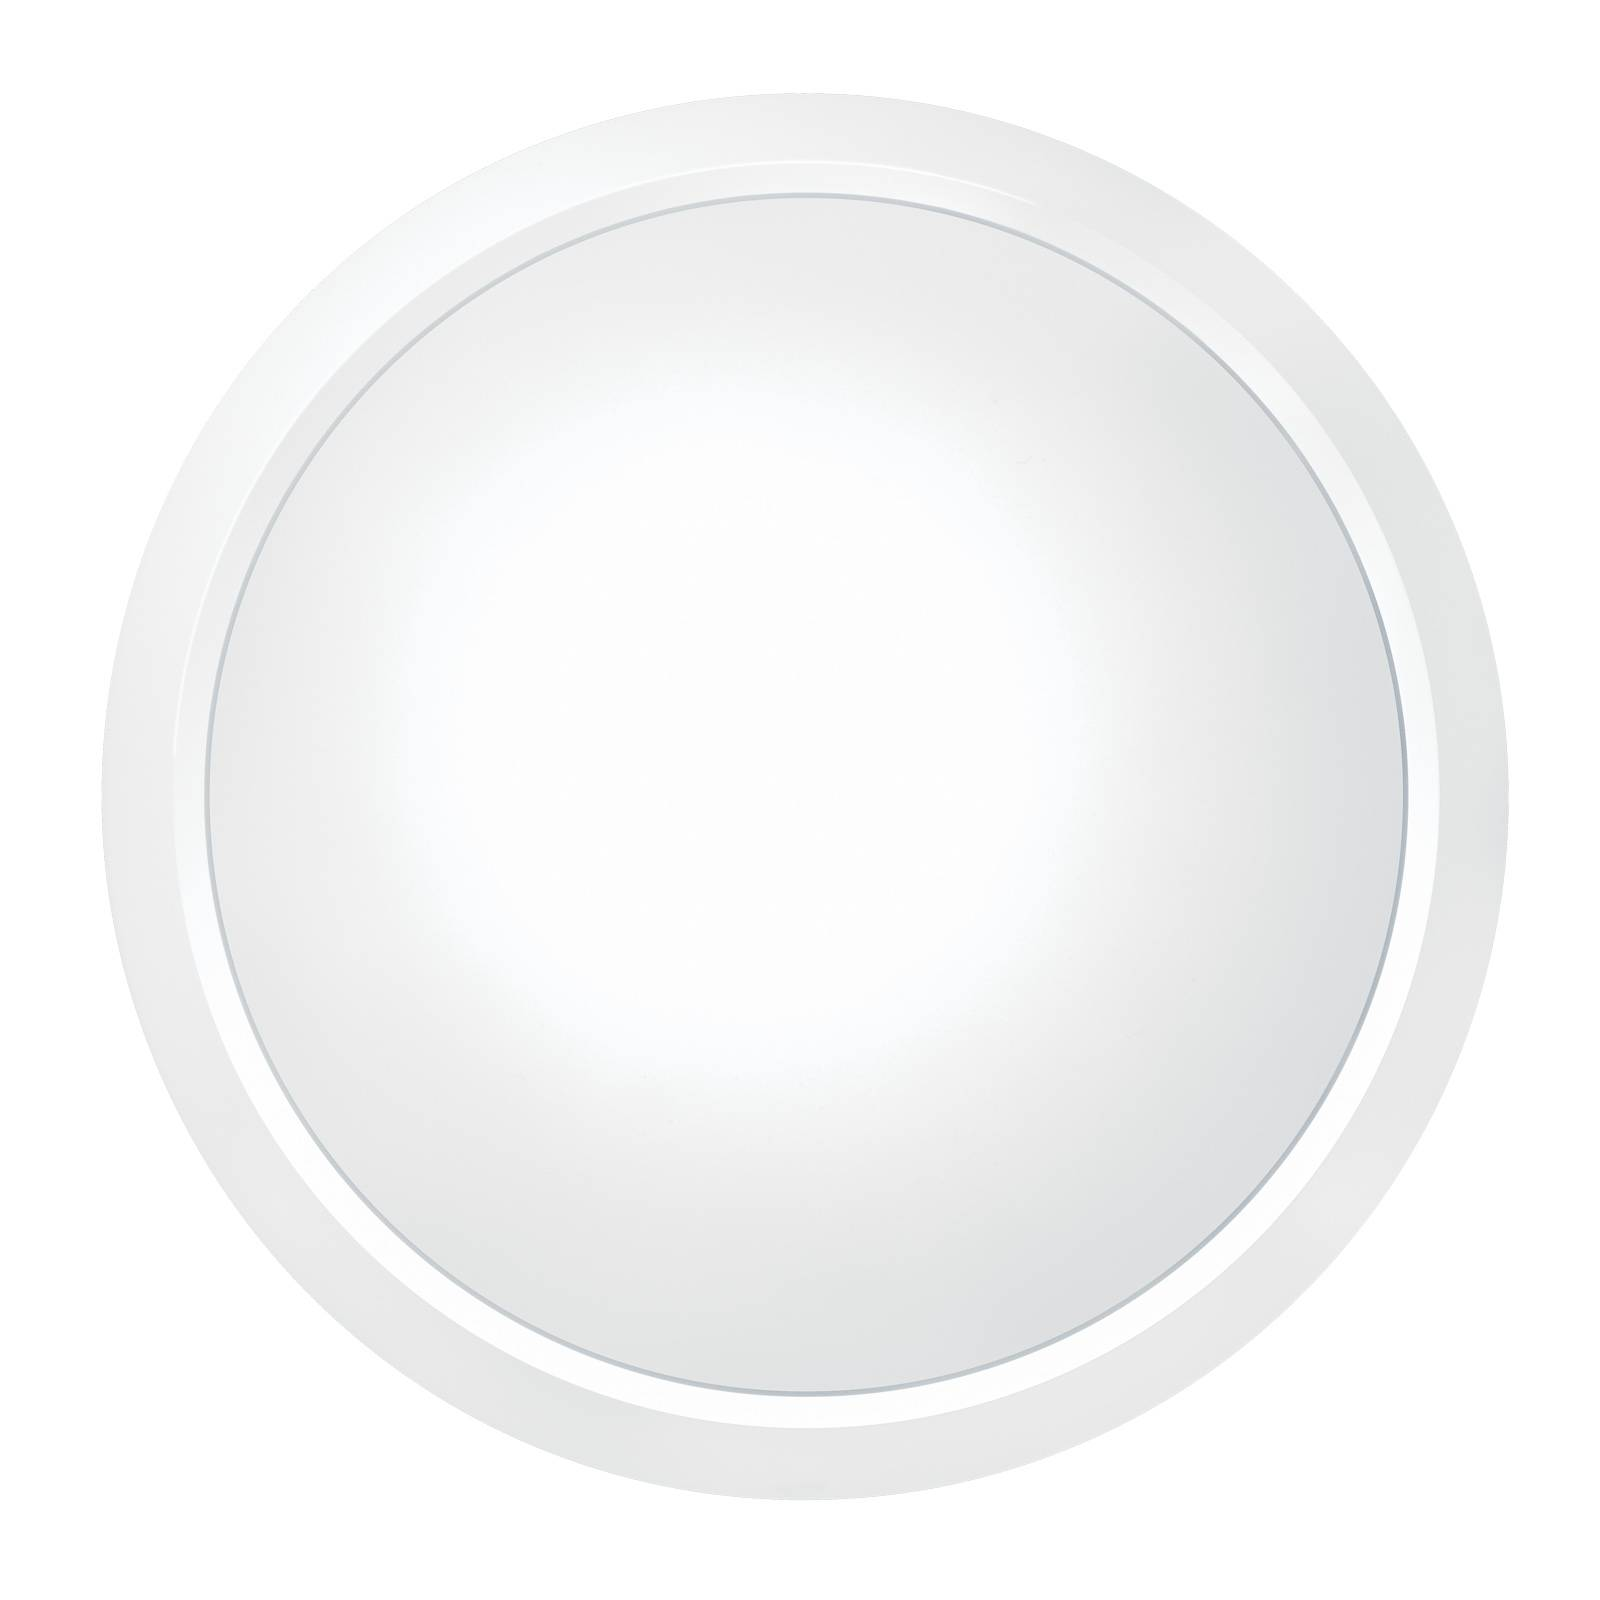 THORNeco Lara Wandleuchte Sensor Dekoring weiß Ø30